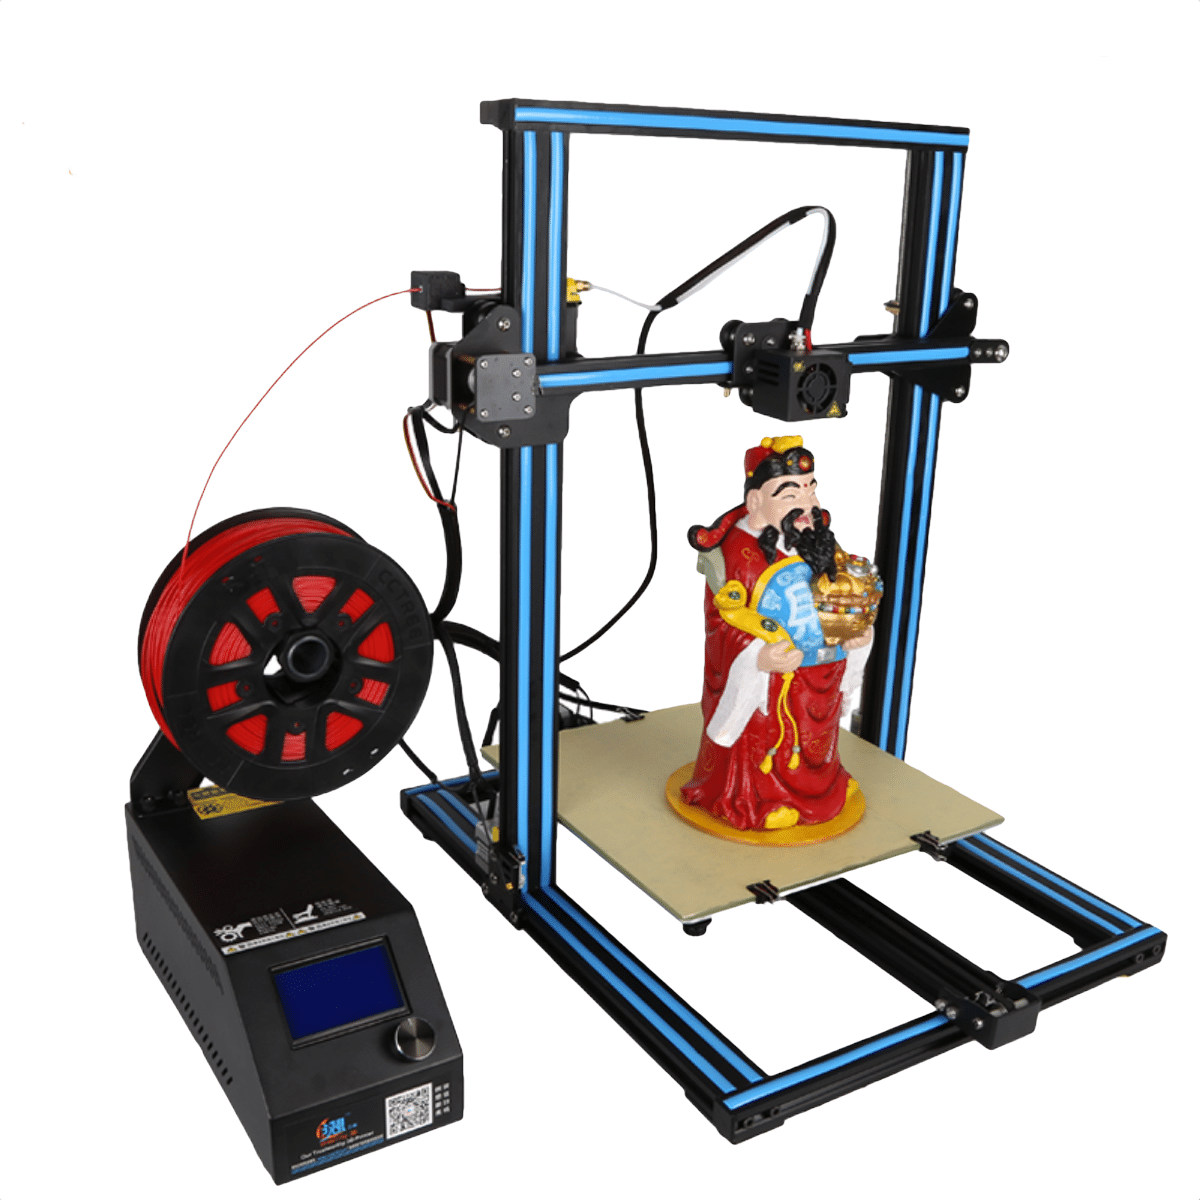 CREALITY 3D CR10S Printed Model